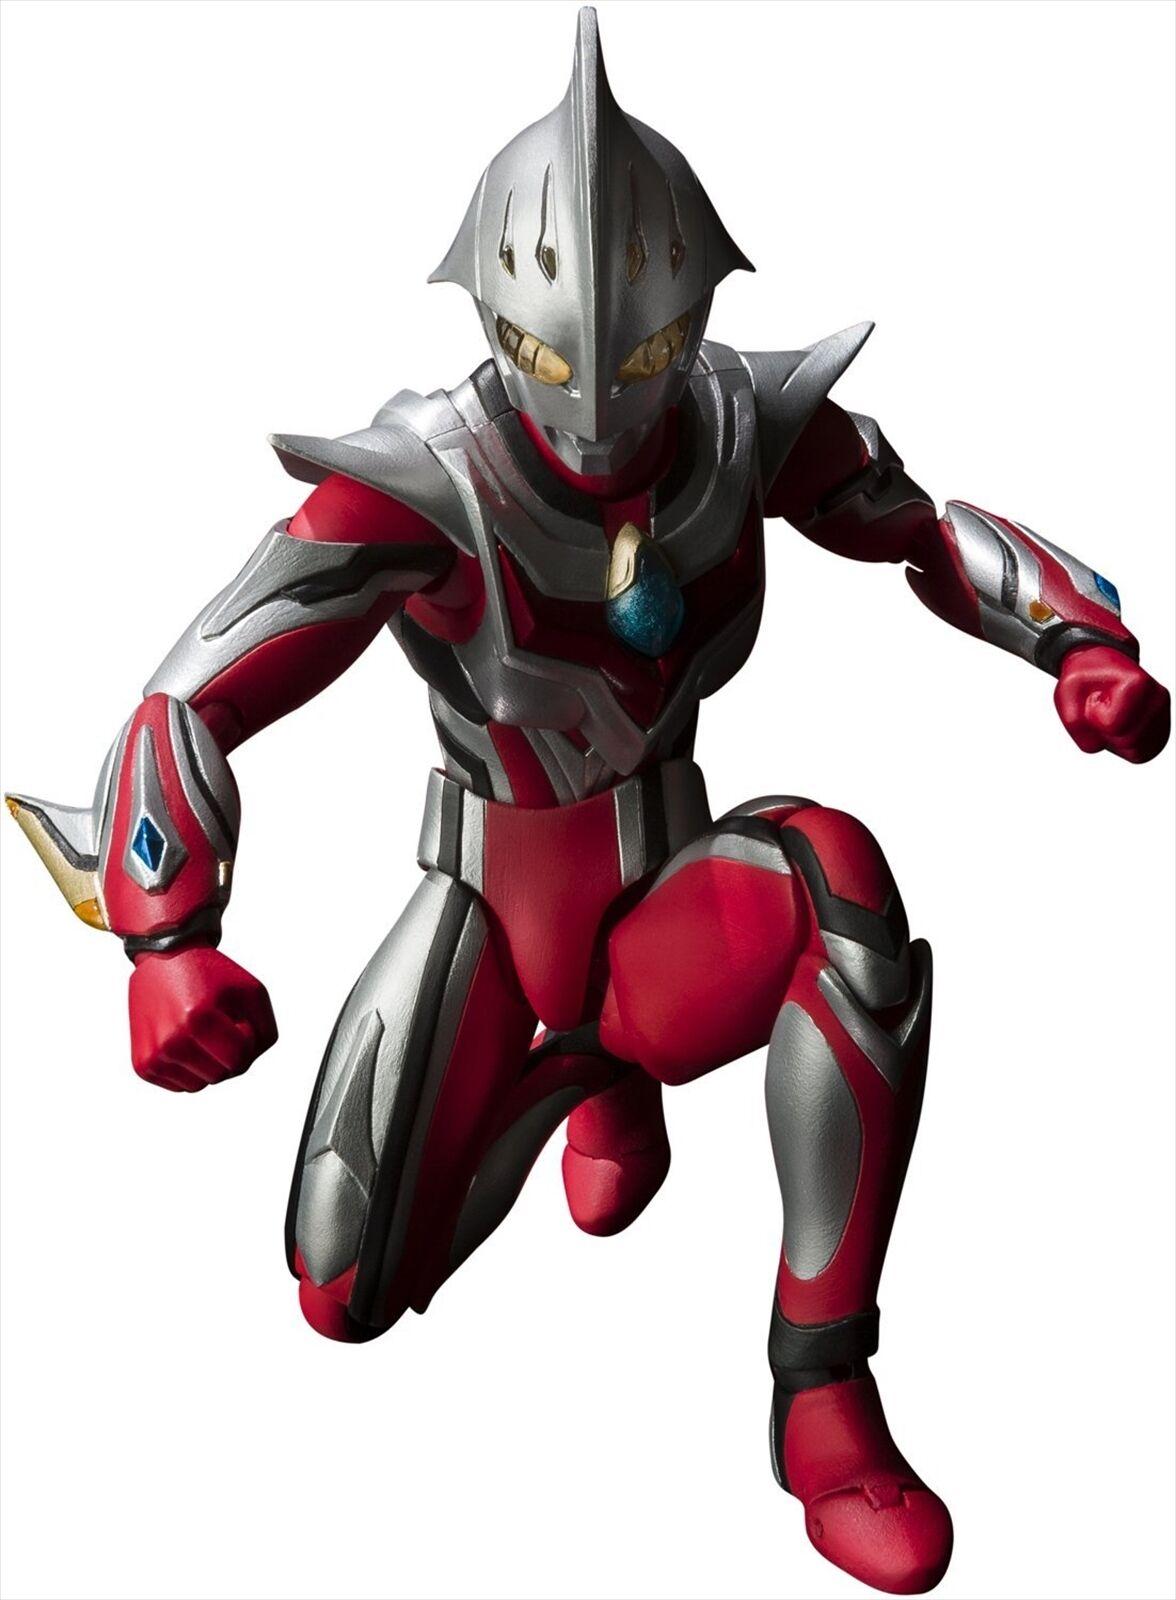 Bandai Tamashii Nations ULTRA-ACT Ultraman Nexus Junis Action Figure